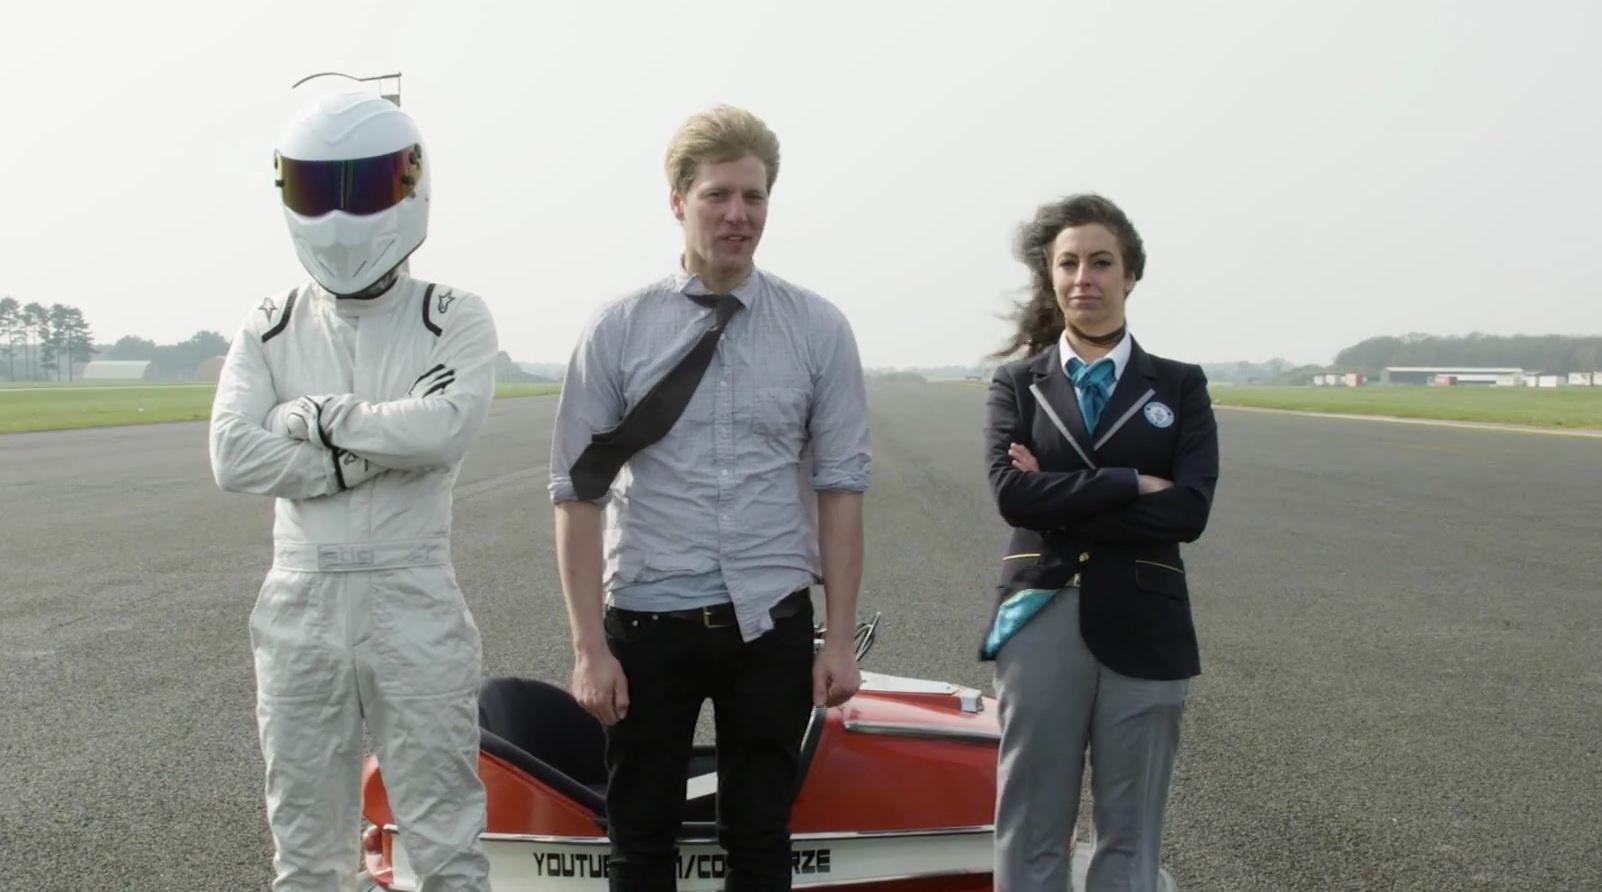 Стиг установил мировой рекорд скорости на аттракционном электромобиле